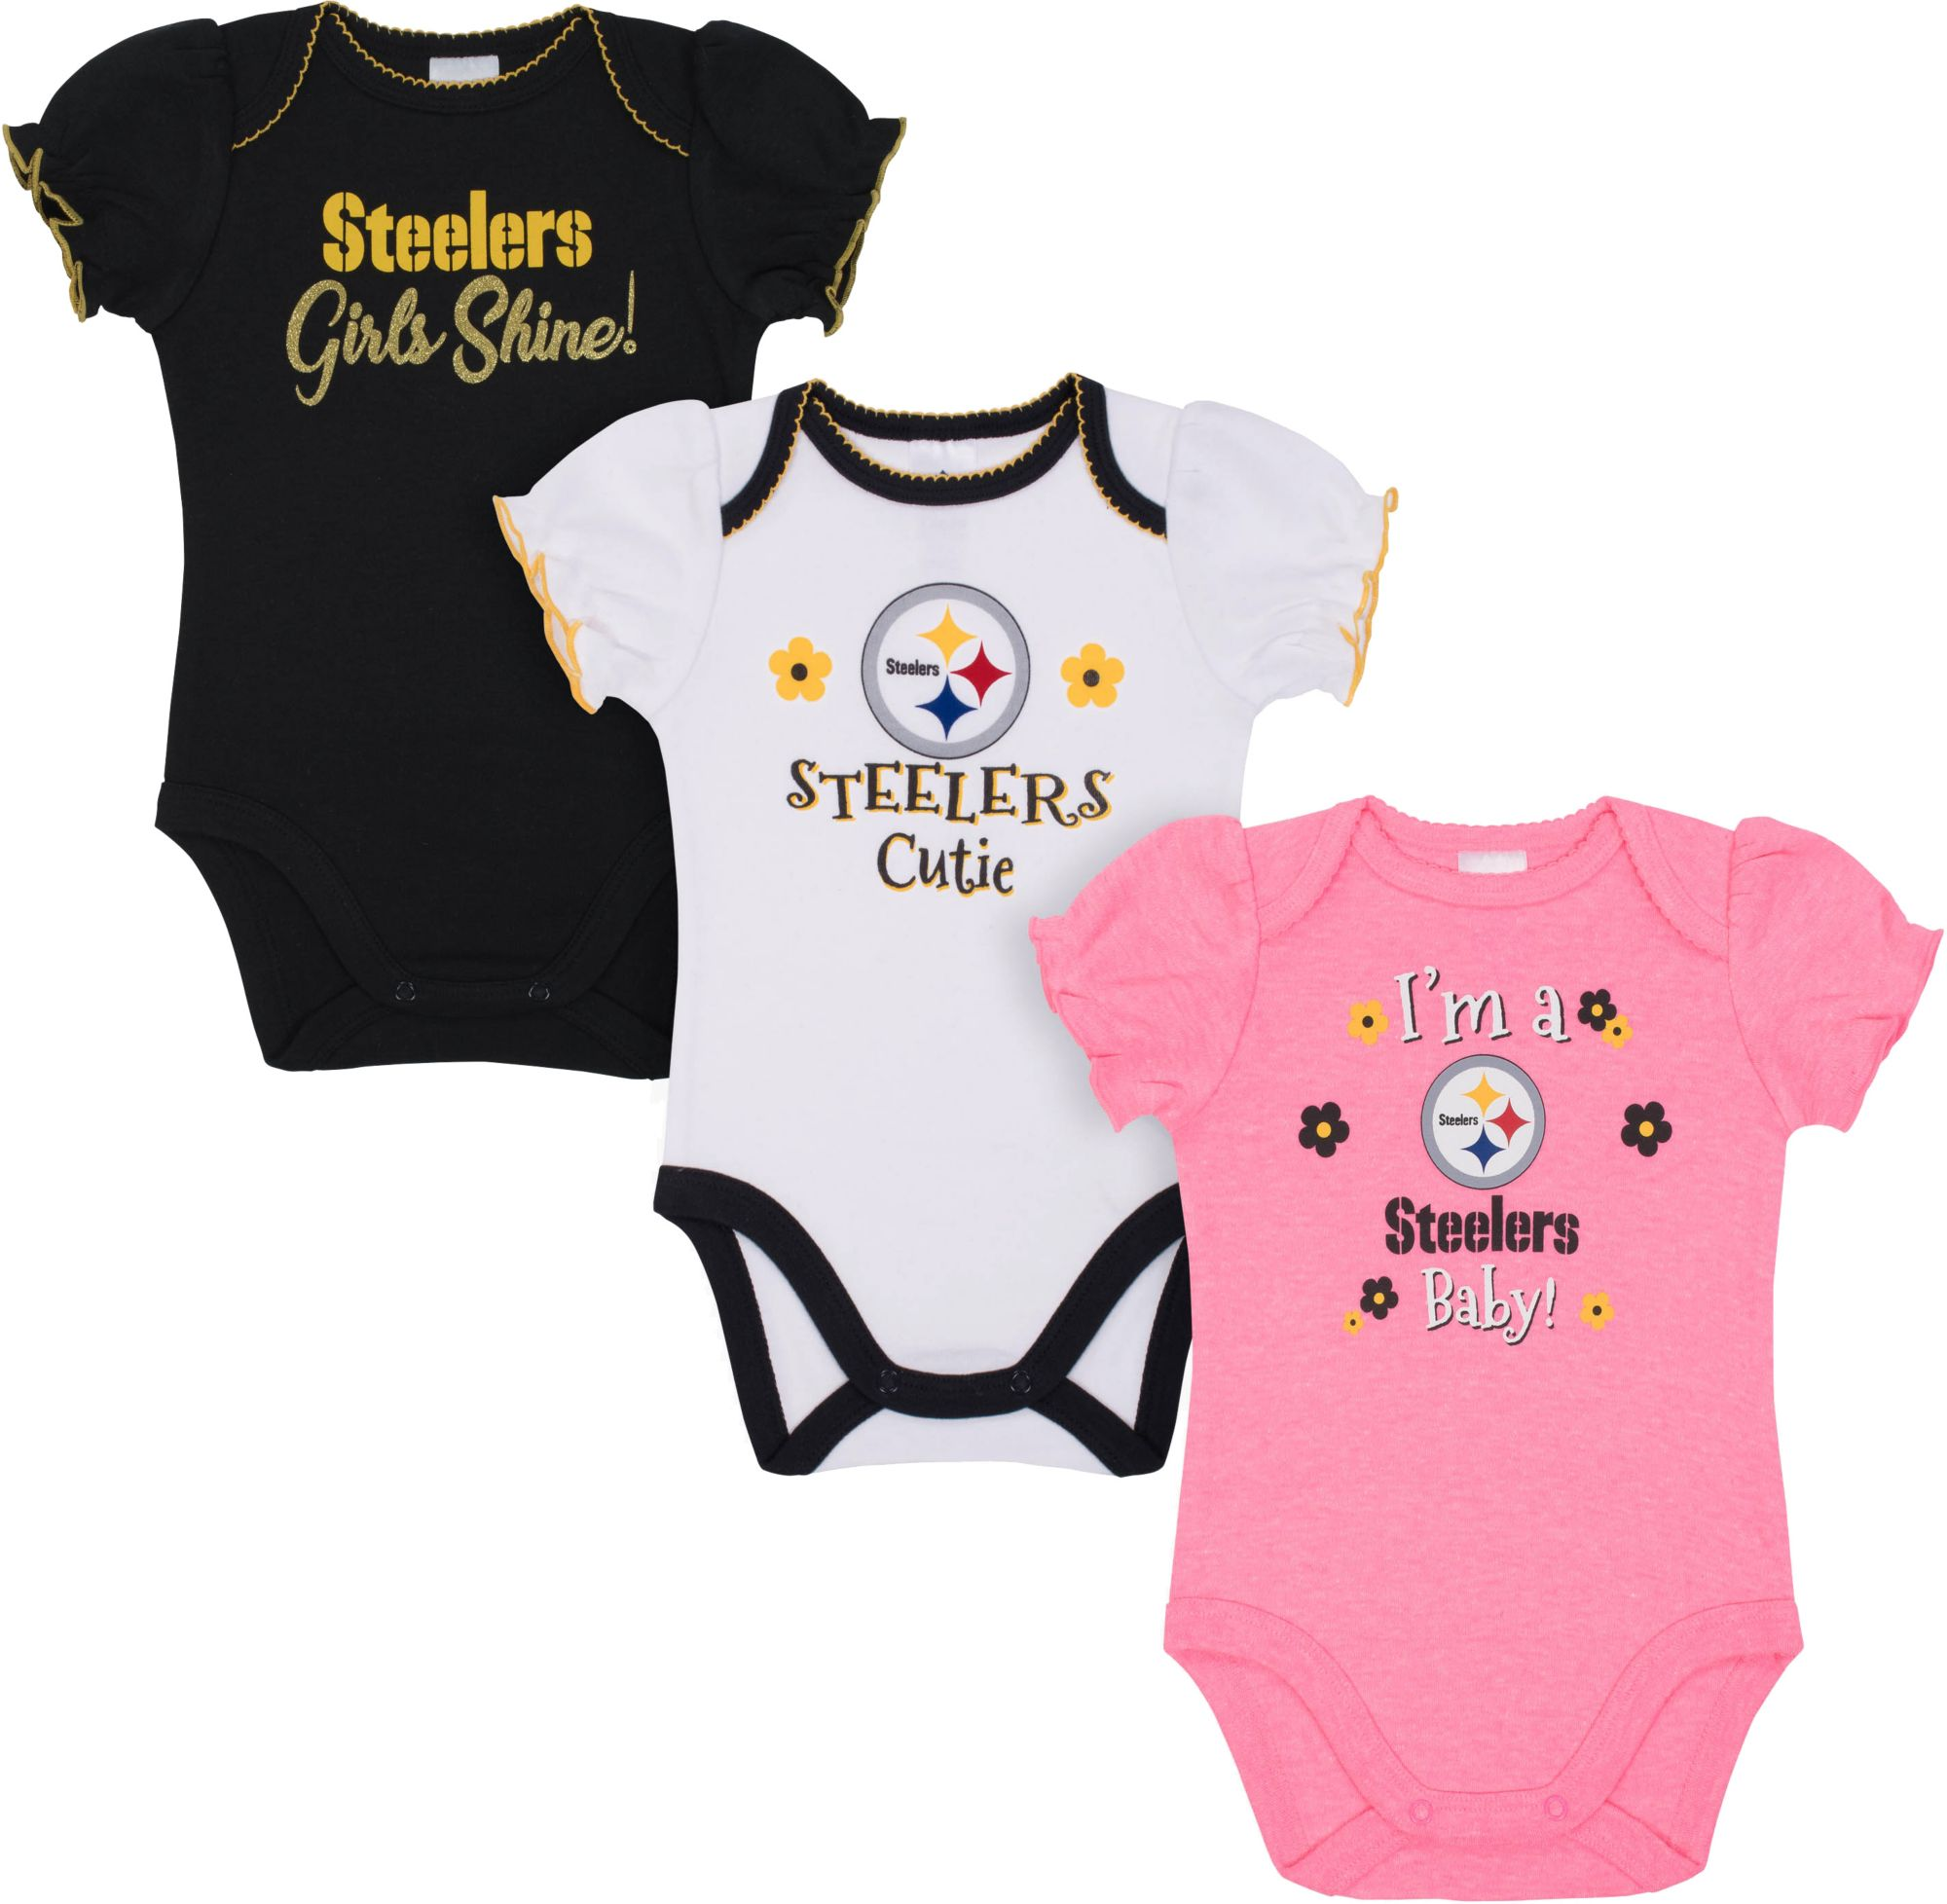 baby steelers shirt